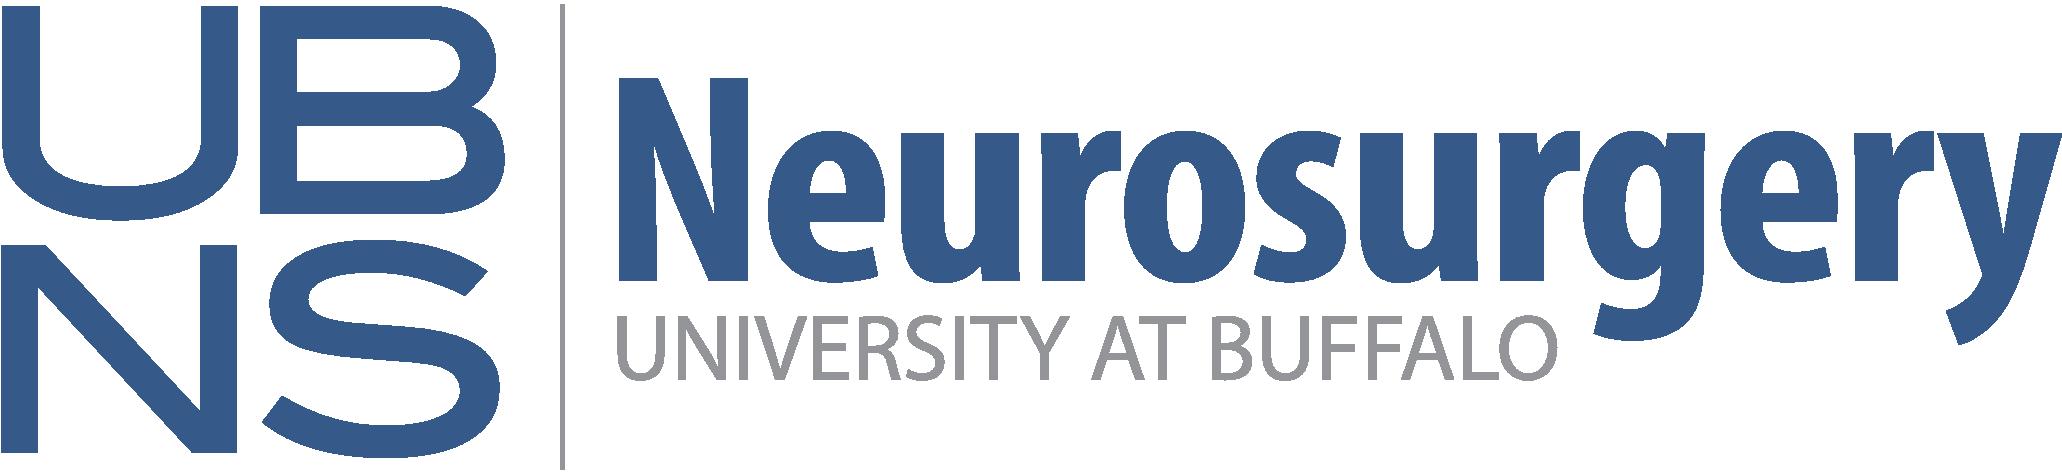 University At Buffalo Neurosurgery Logo